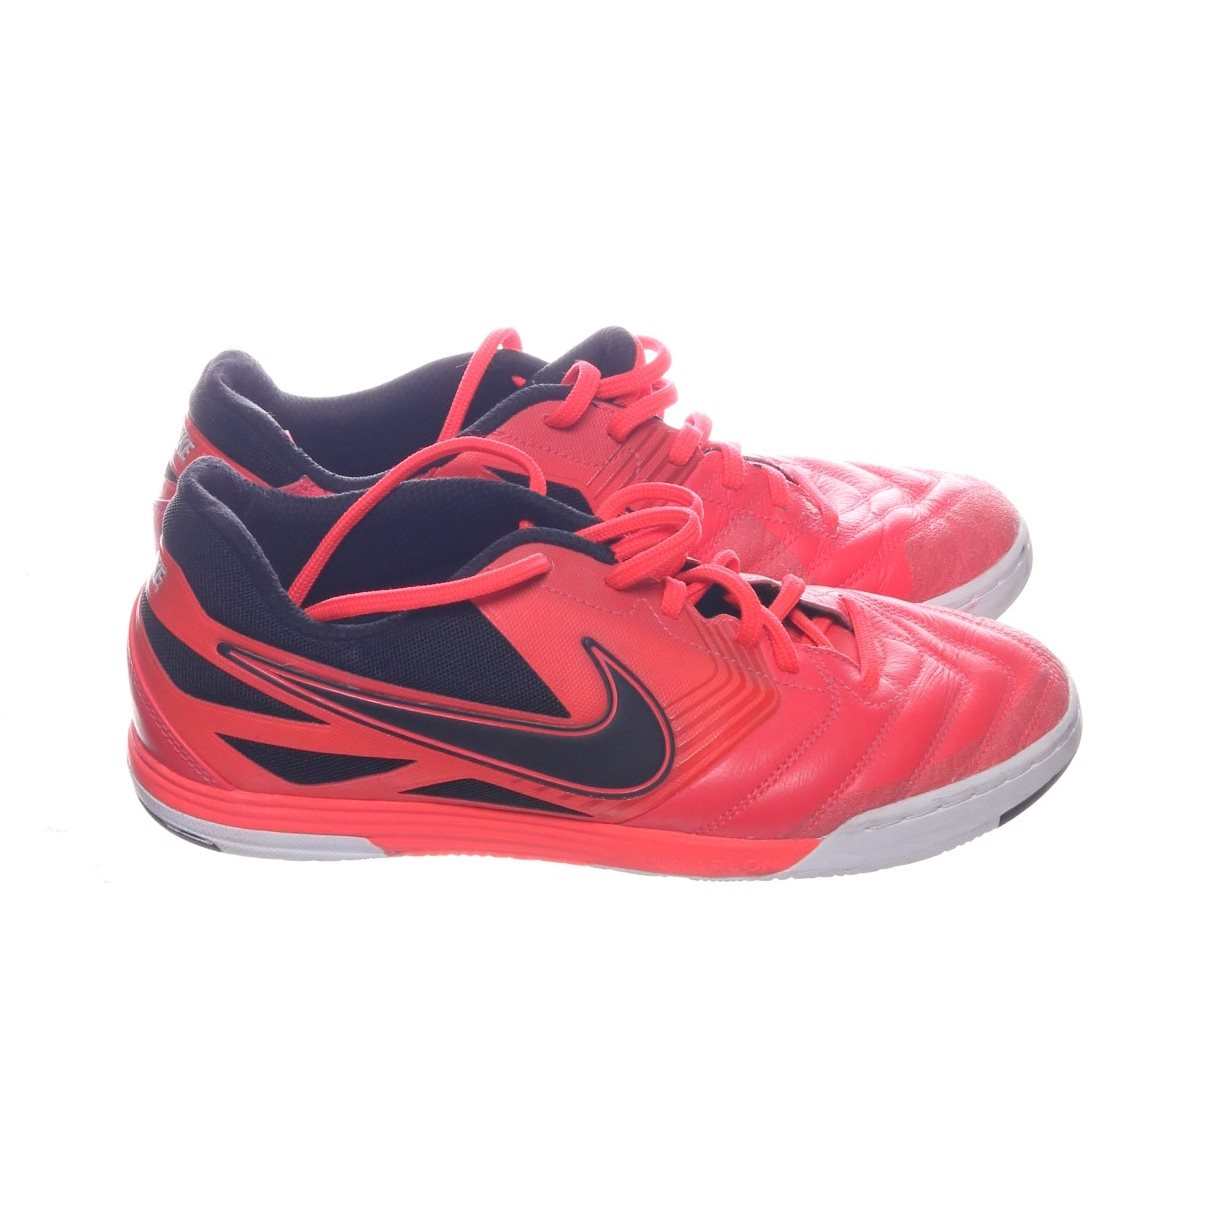 c70ff3157db ... brand new 2c5b1 42001 Nike, Inomhusskor, Strl 41, Lunar Gato,  KorallfärgadSvart